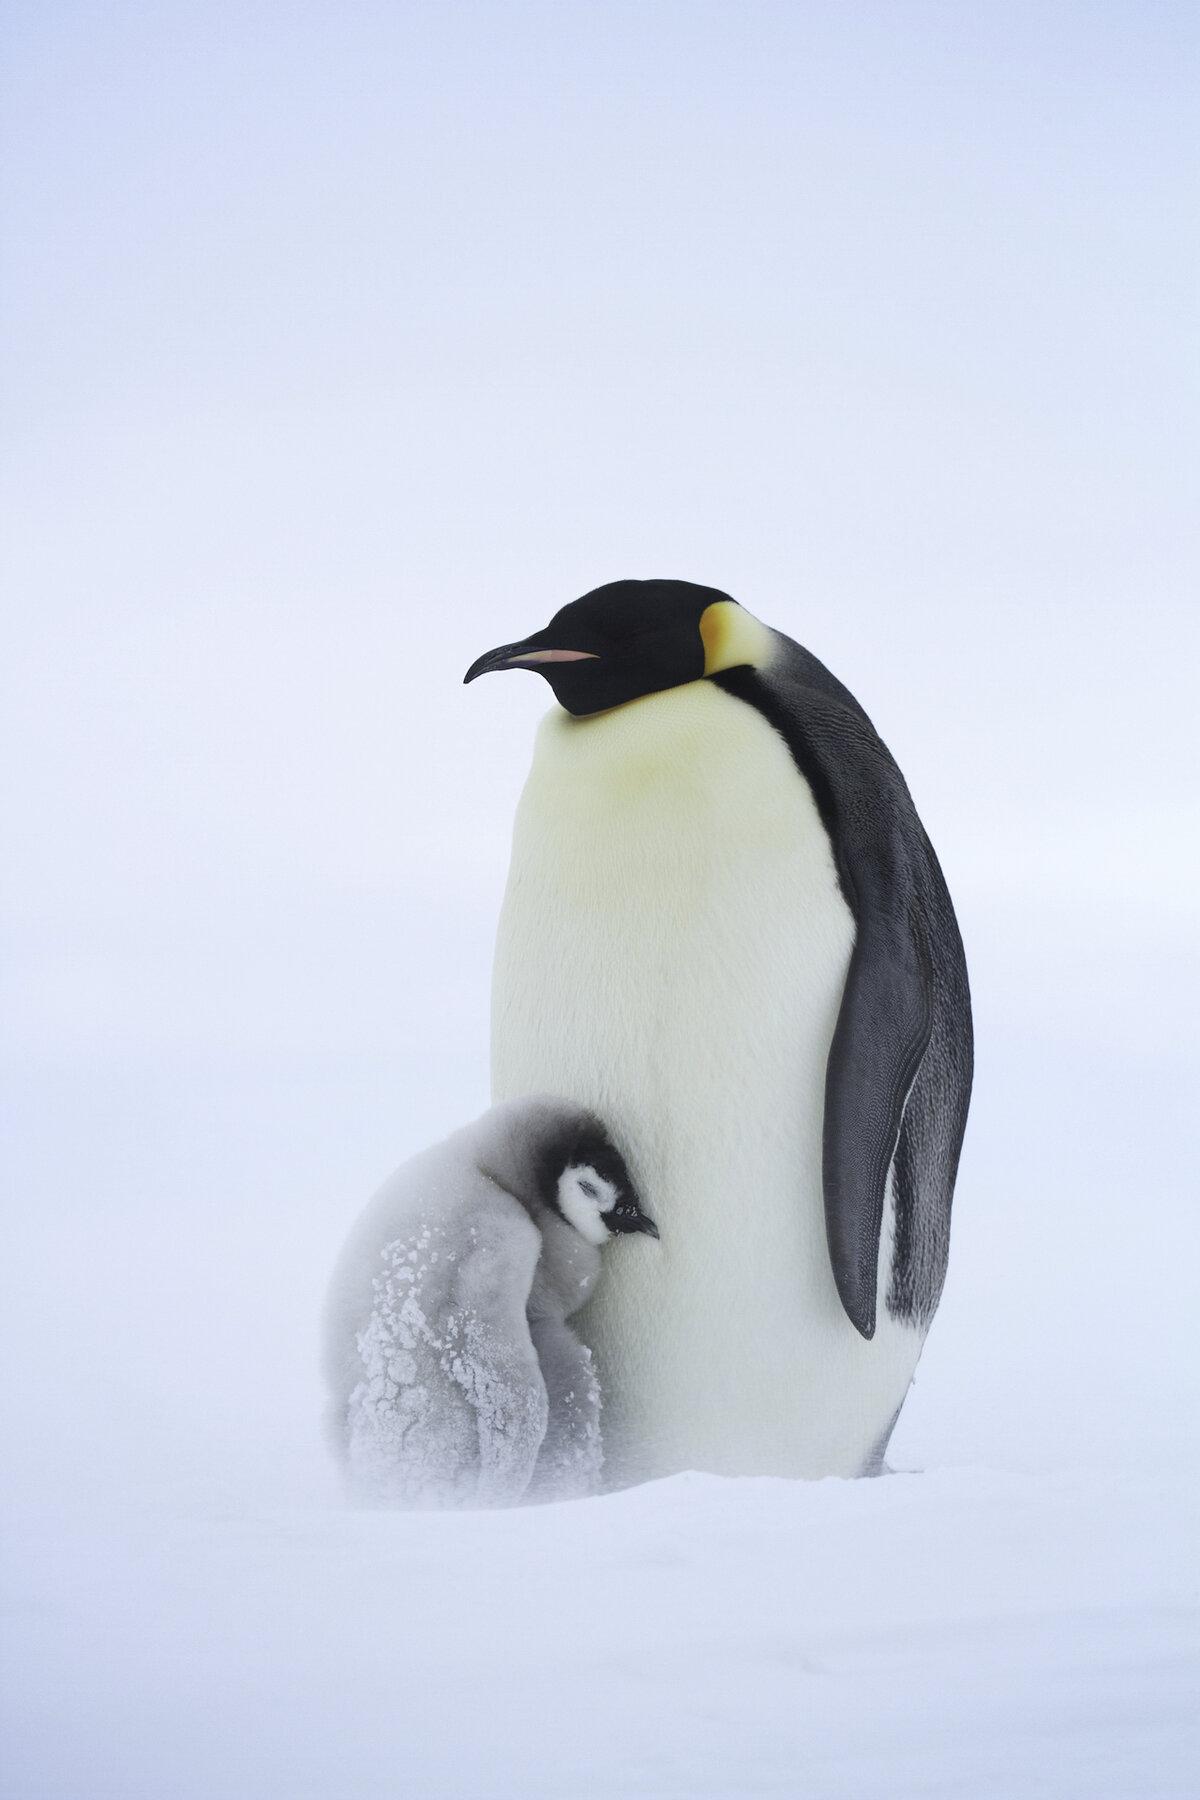 Chick huddles against parent during a snow storm